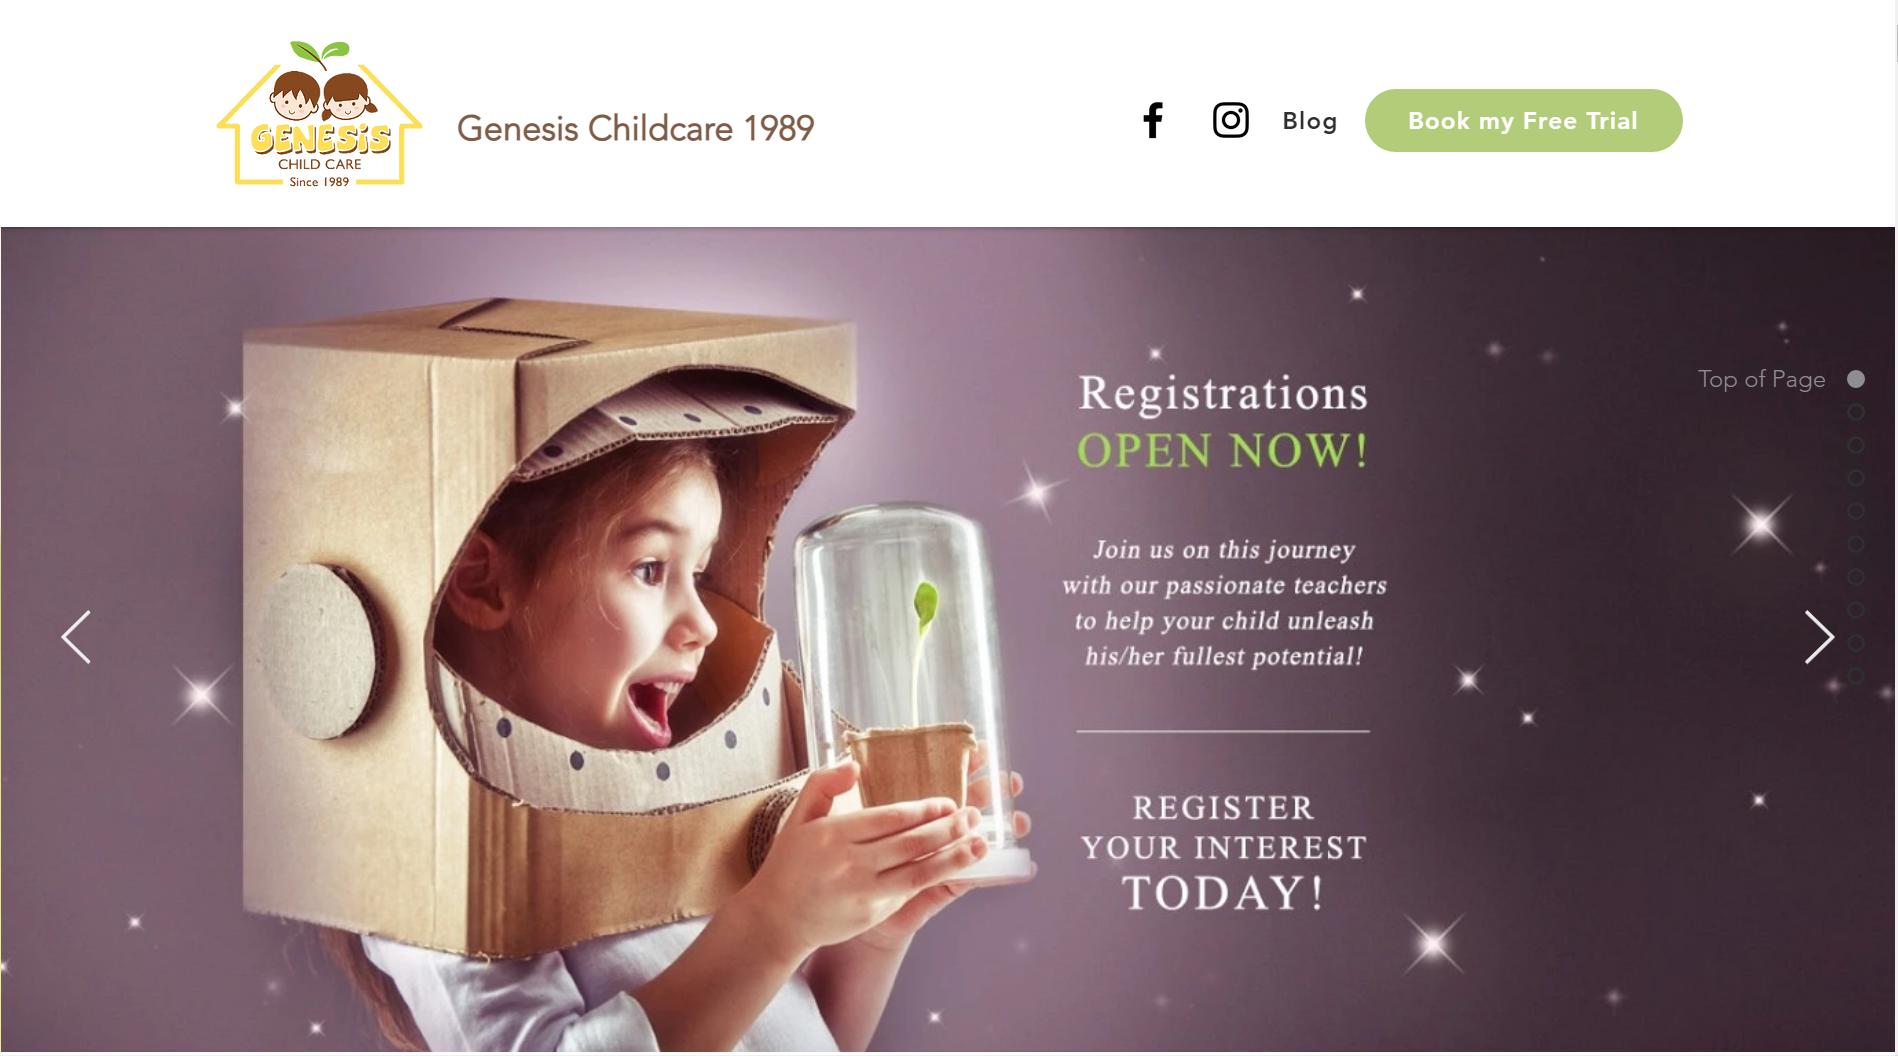 Genesis Child Care